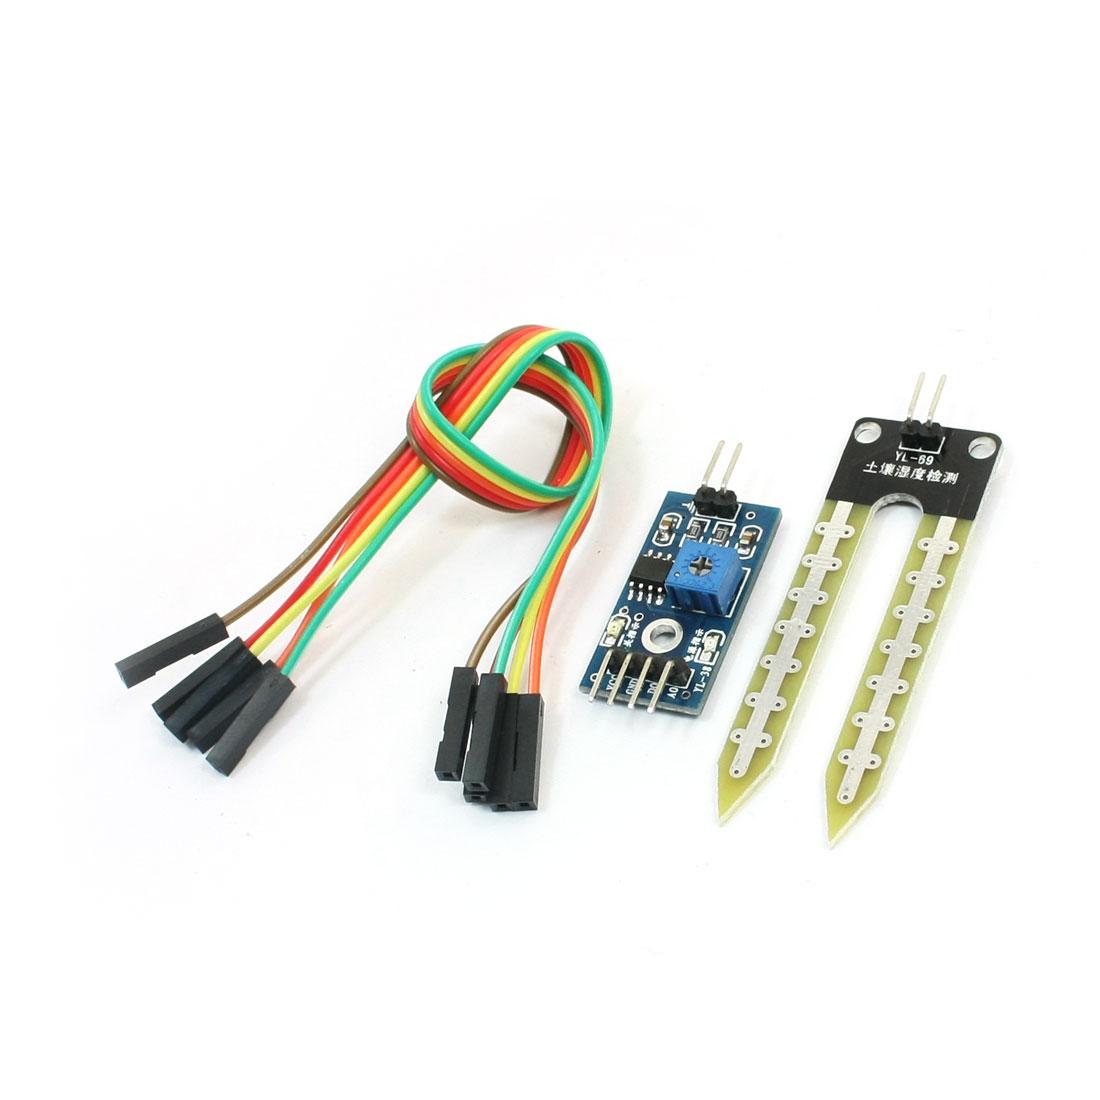 LM393 Chip Soil Humidity Detection Sensor Module Board DC 3.3-5V